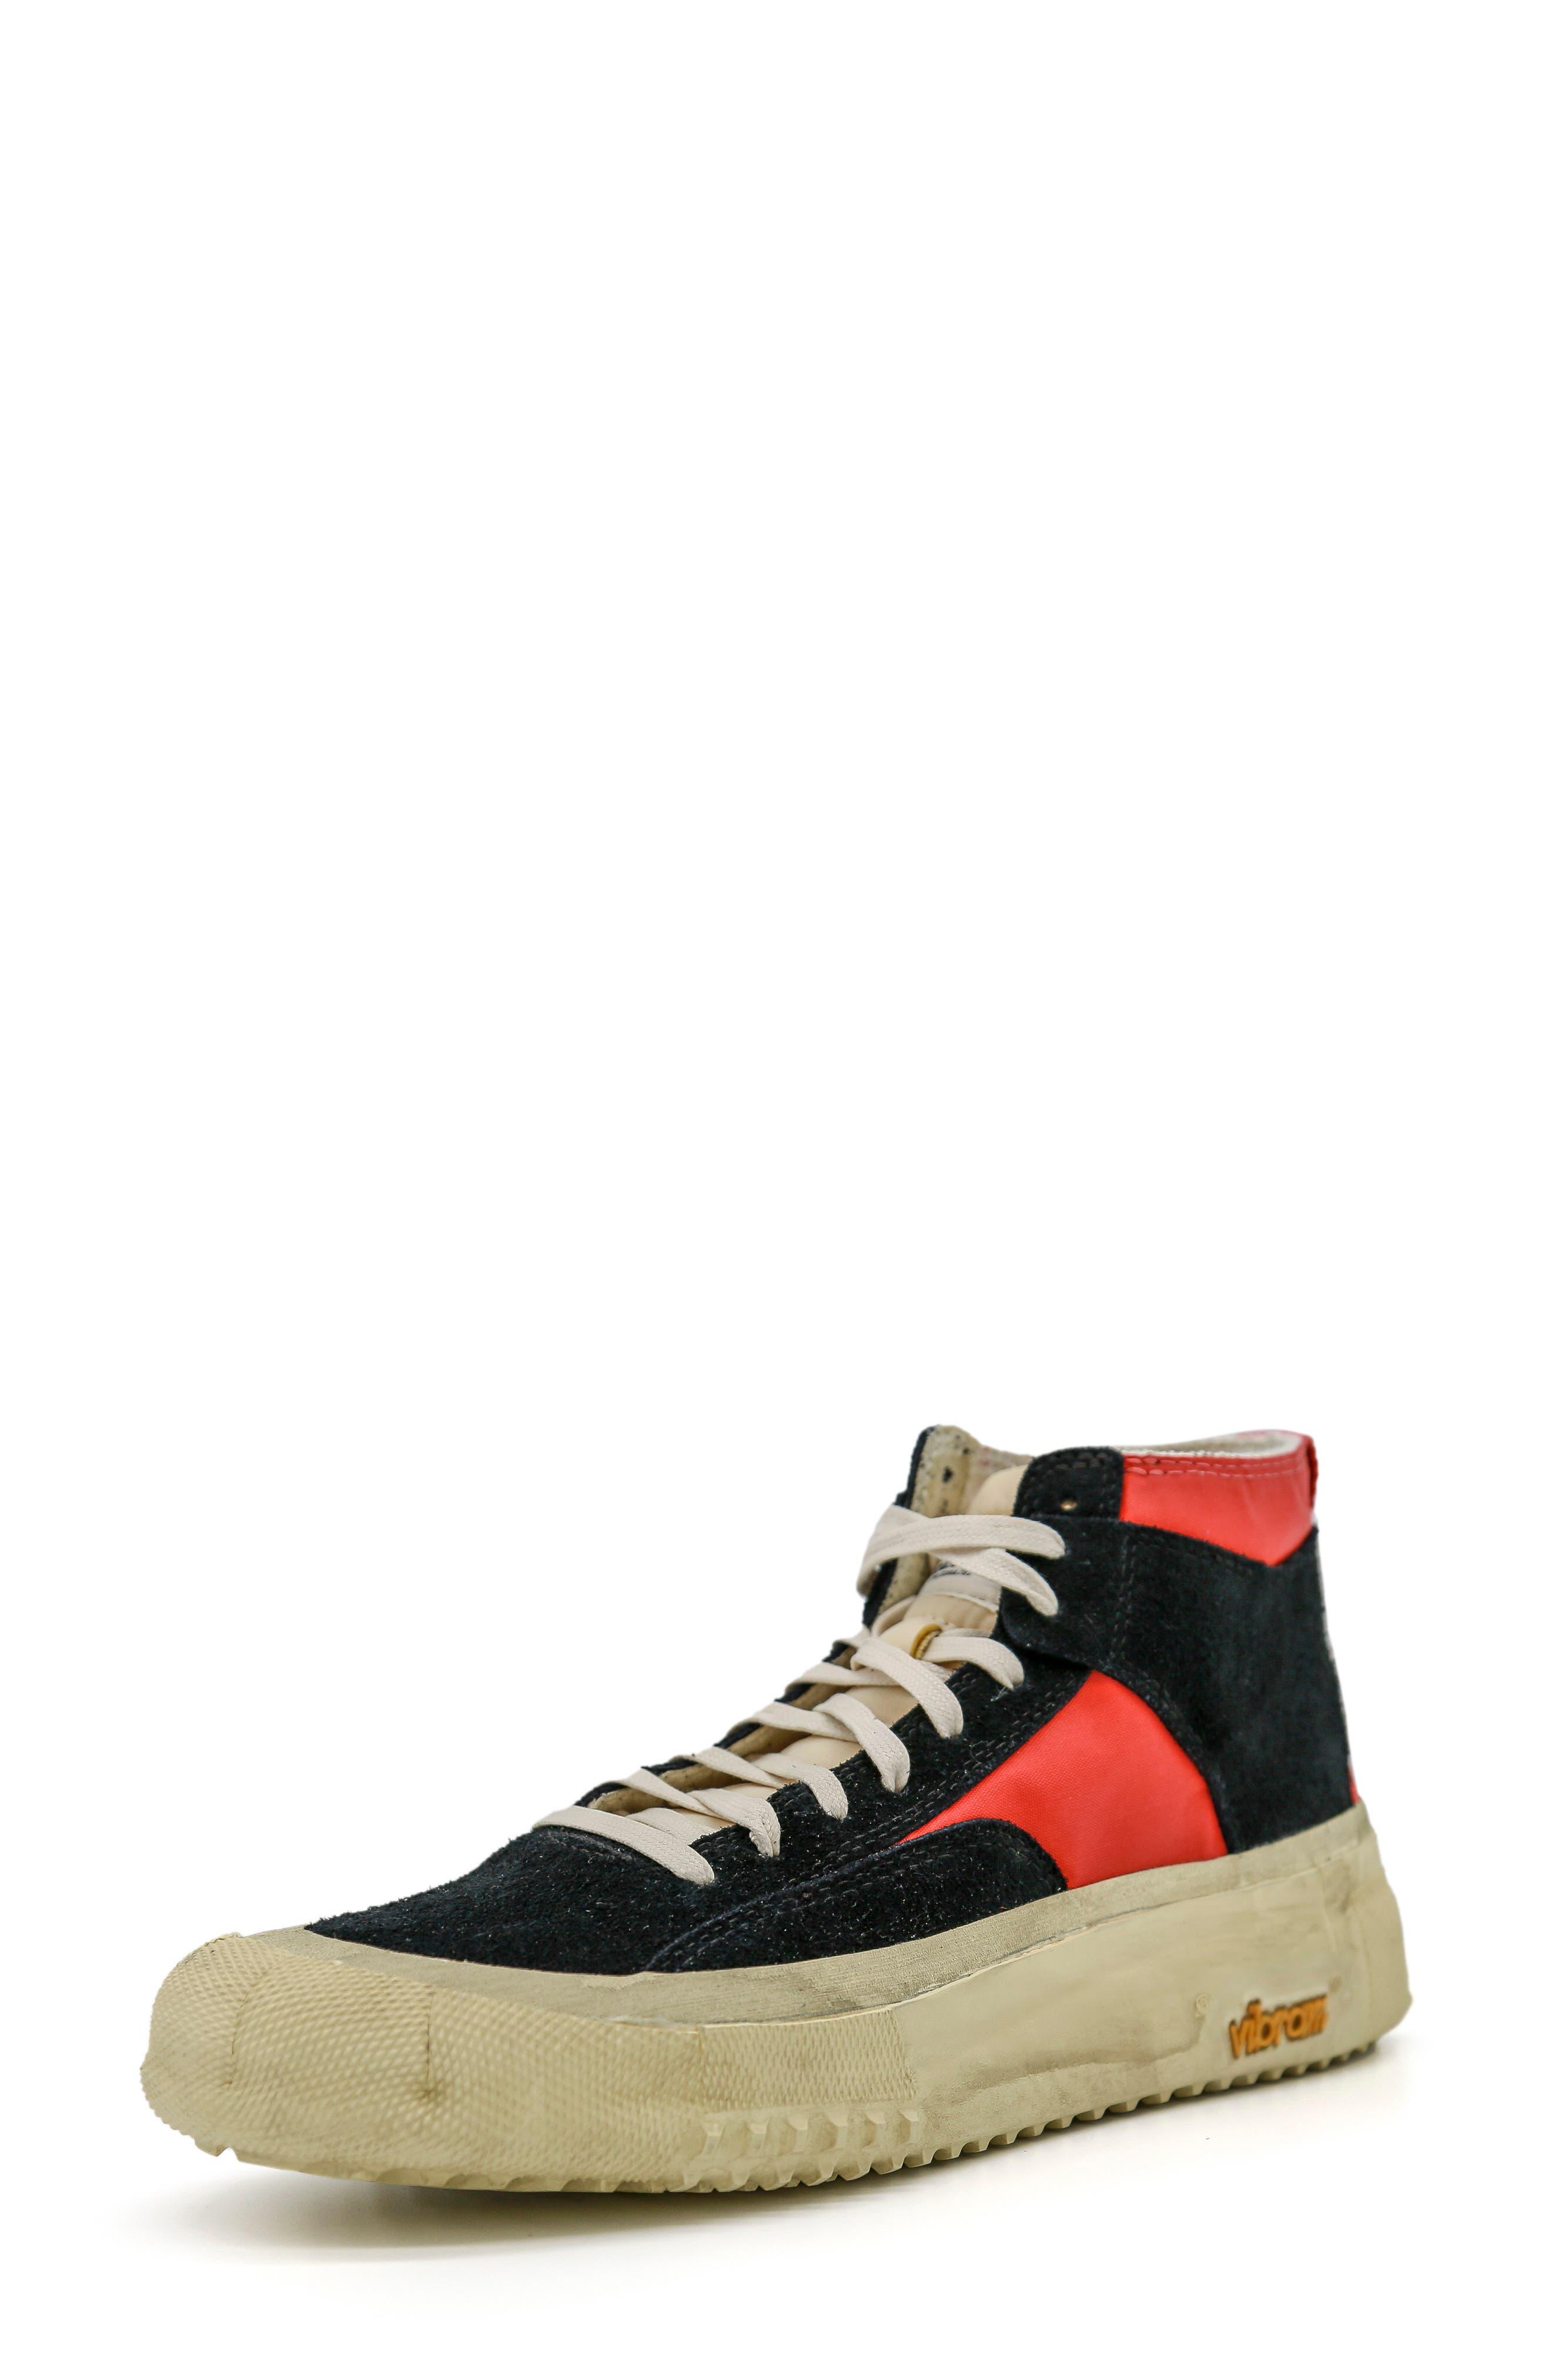 Capo Distressed High Top Platform Sneaker